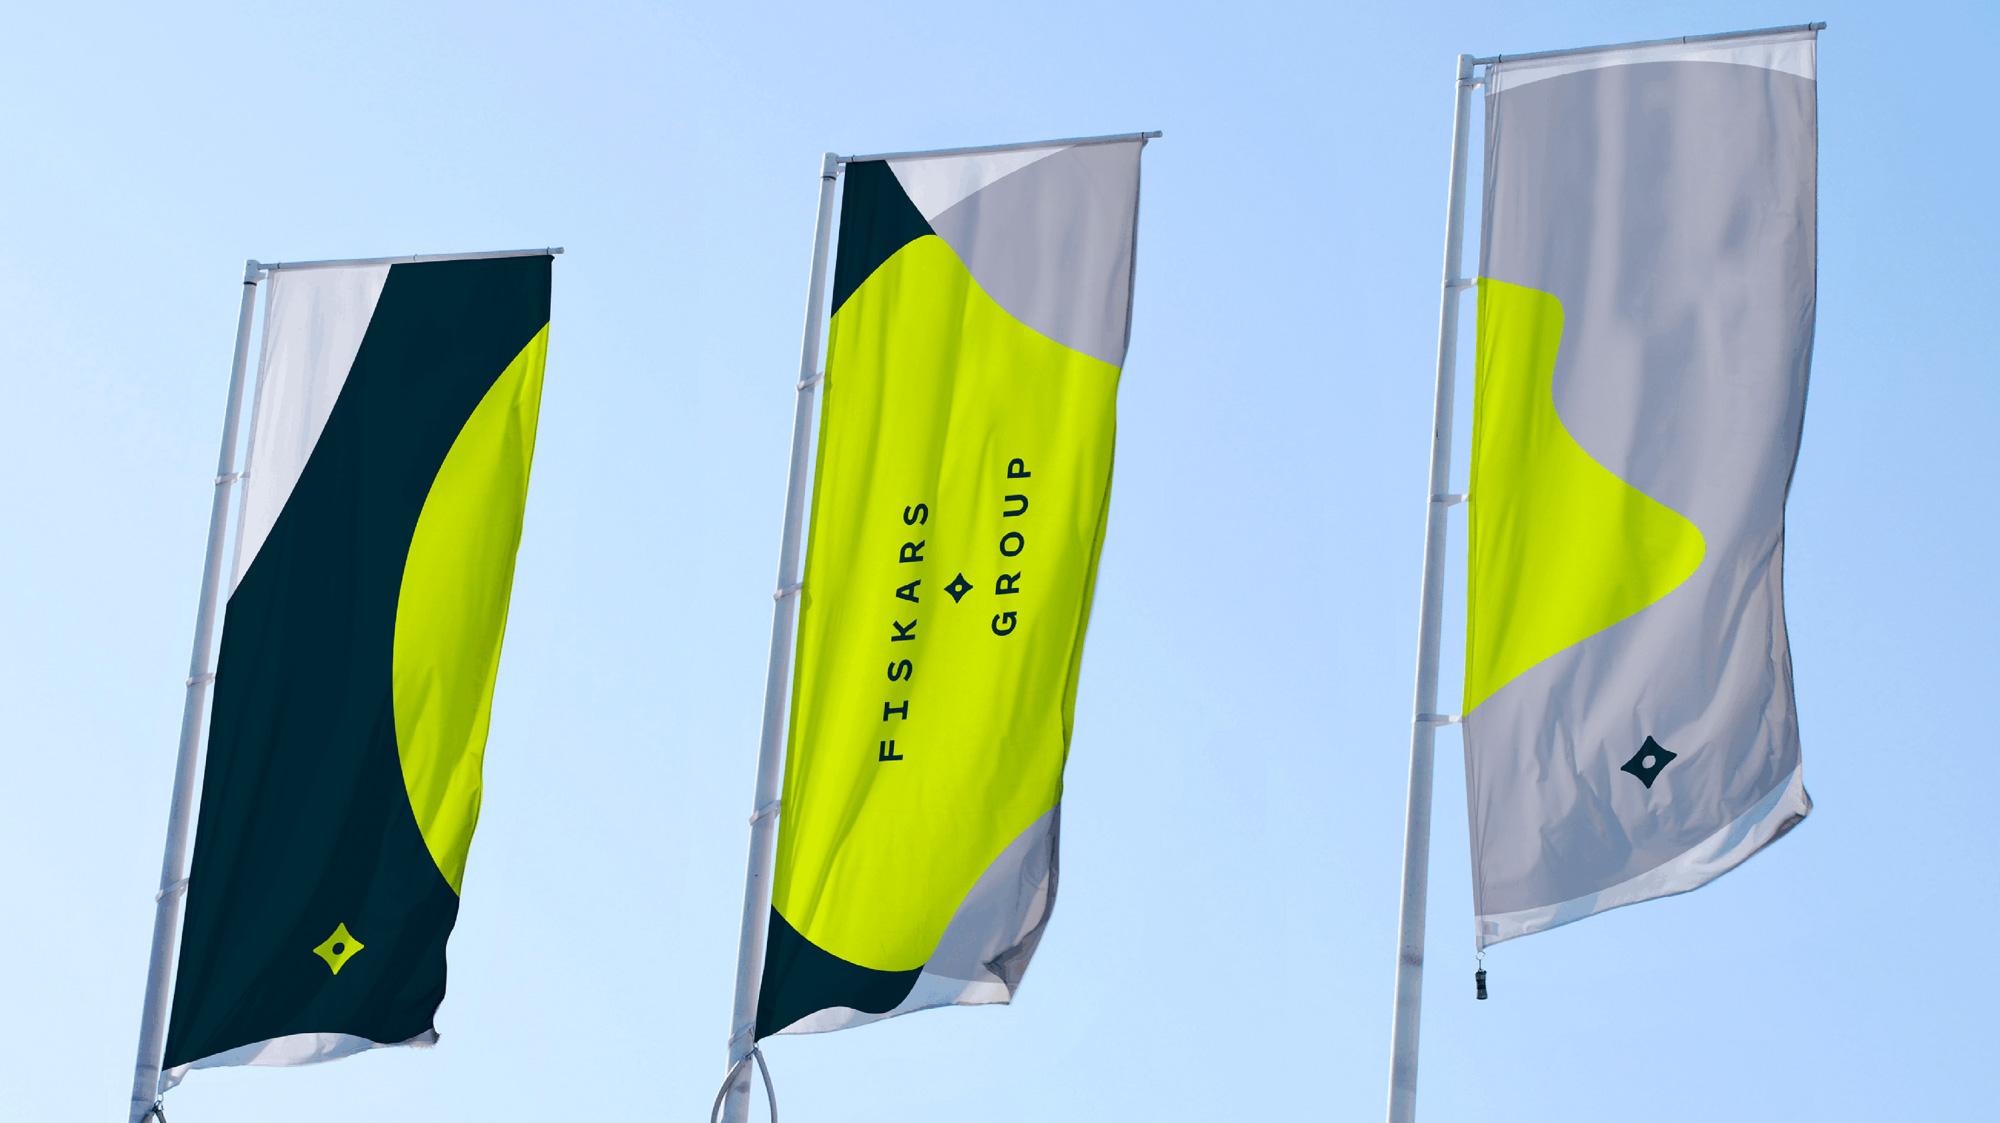 Fiskars Group 启用全新的品牌LOGO和VI形象设计-vi设计10